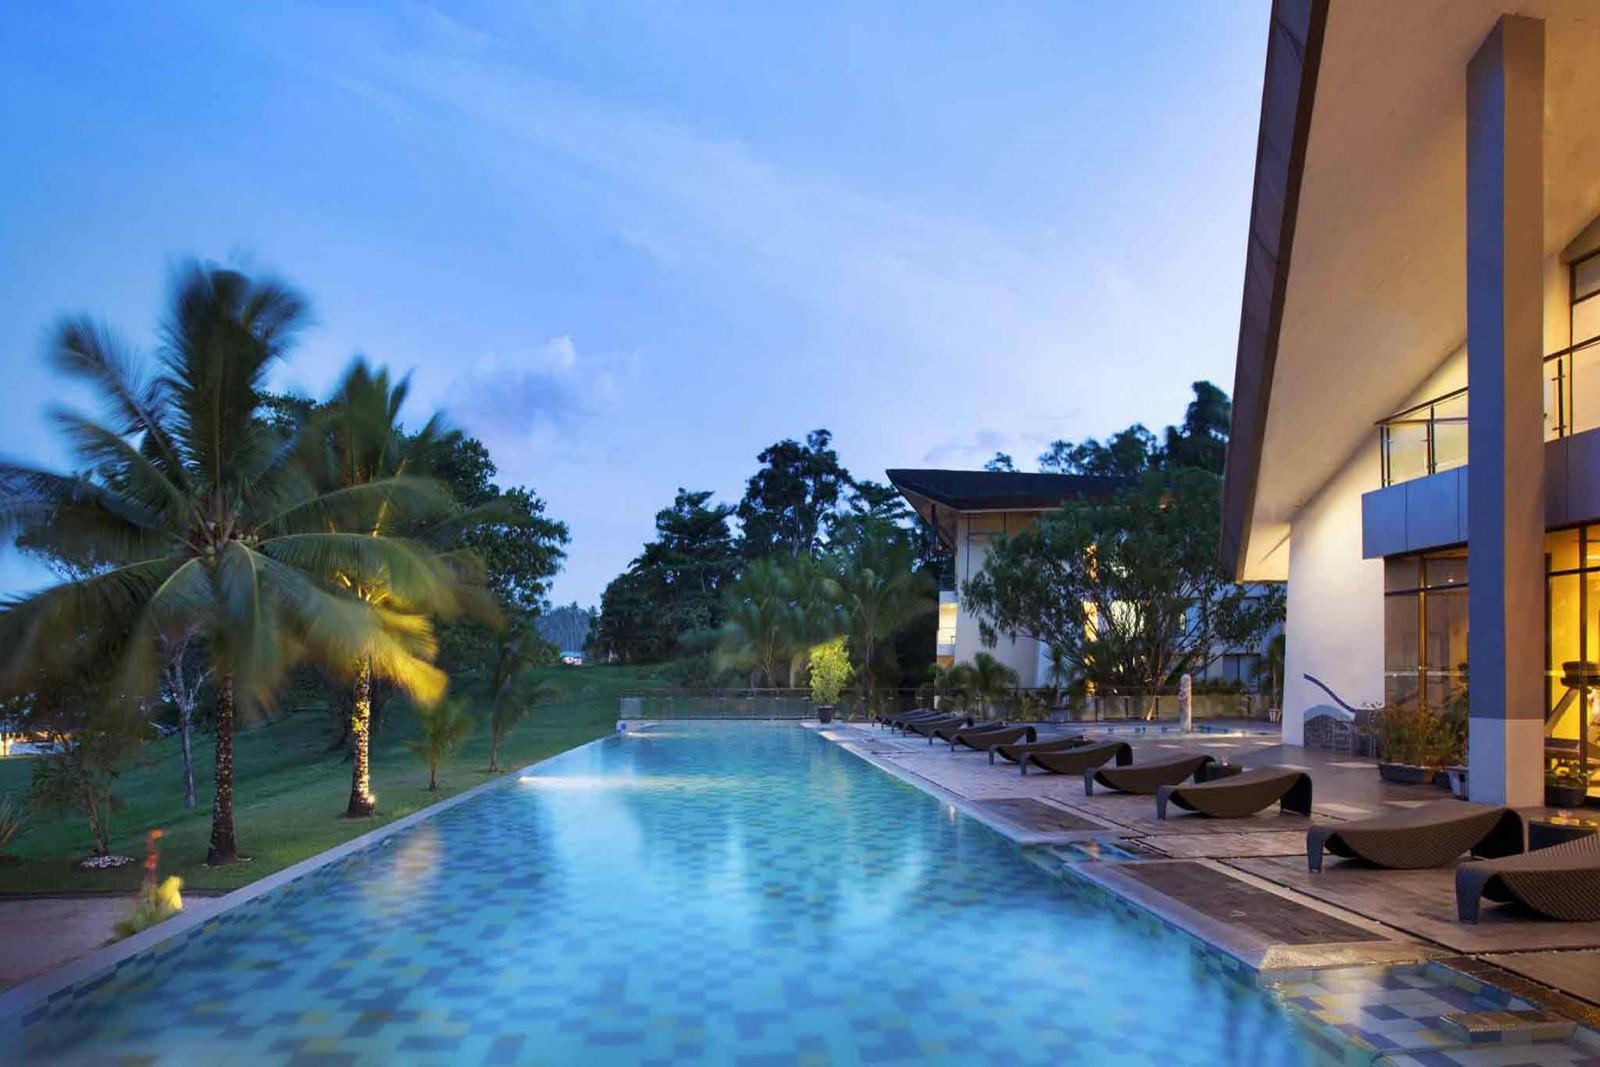 Novotel Manado Golf Resort Reef And Rainforest Tours